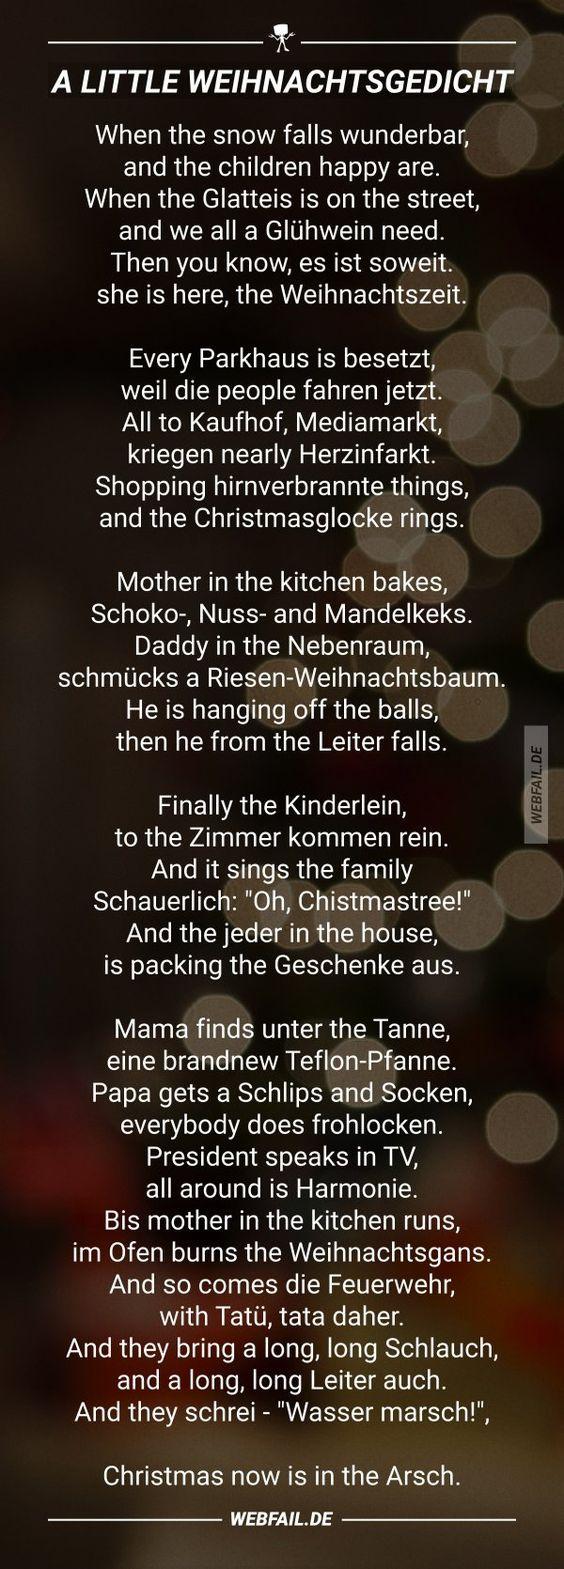 A little Weihnachtsgedicht | Mama | Pinterest | Christmas, Christmas ...